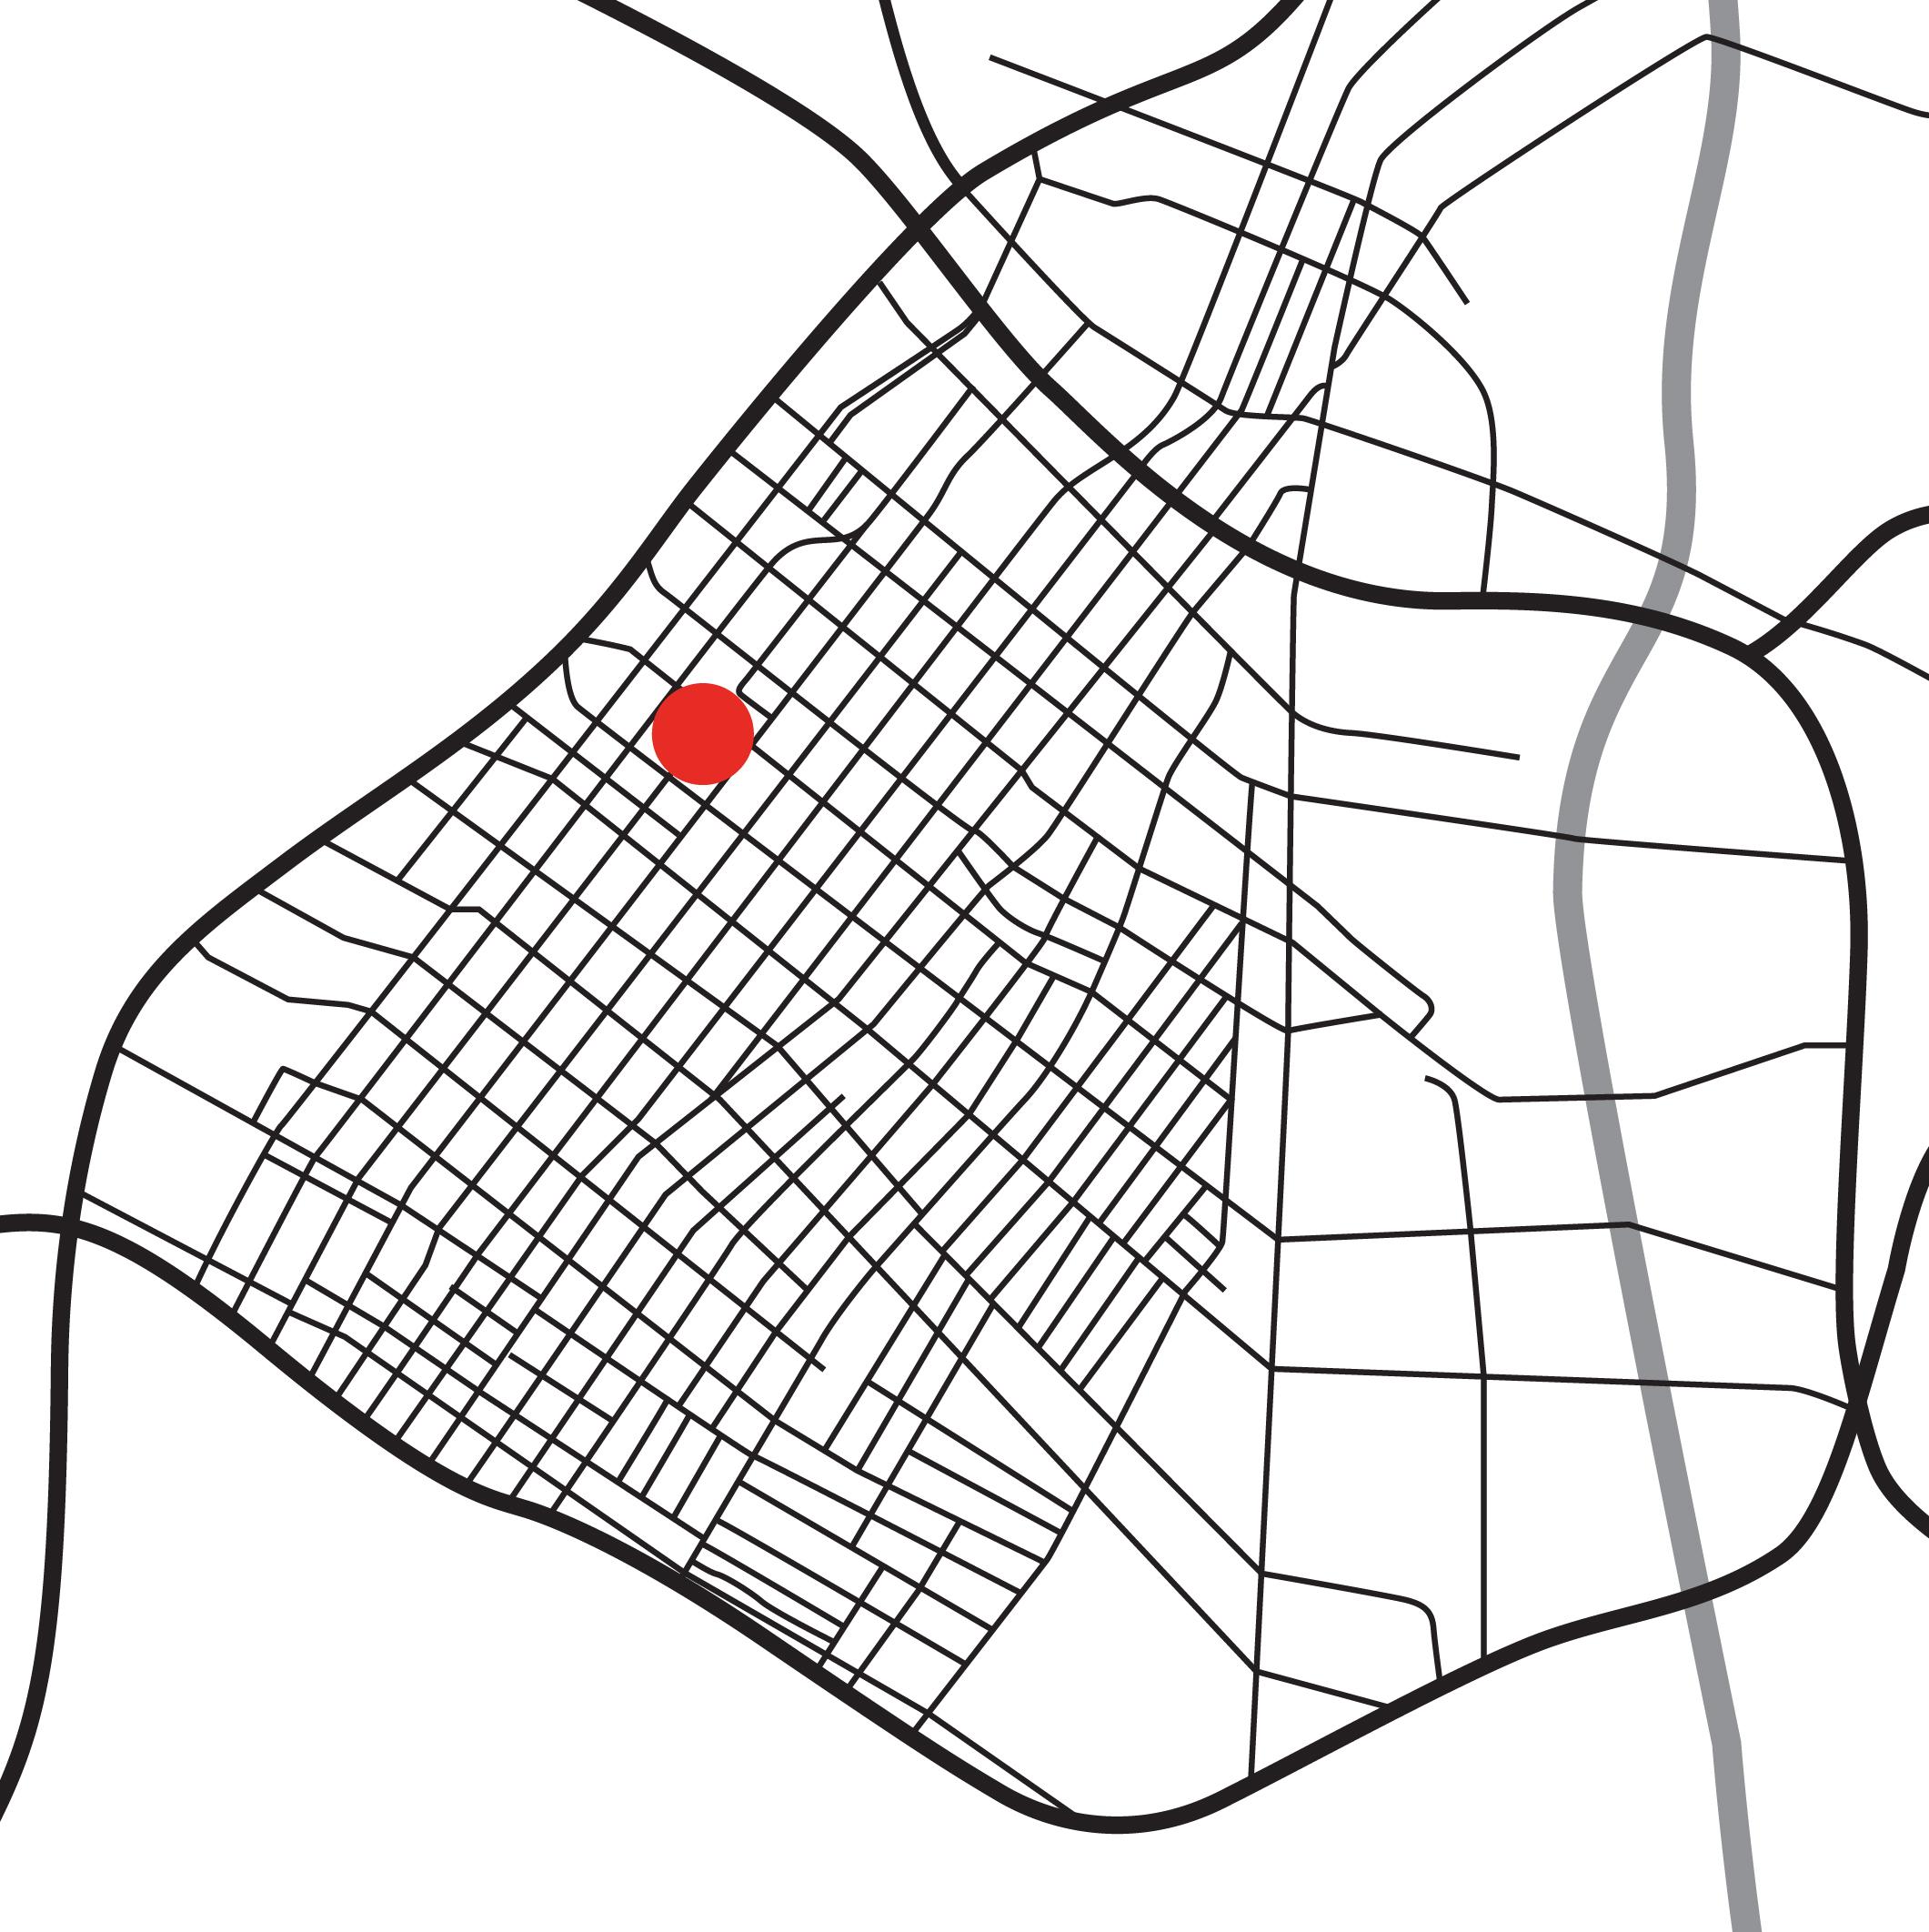 DTLA_MAP_003_Los Angeles Central Library-01.jpg